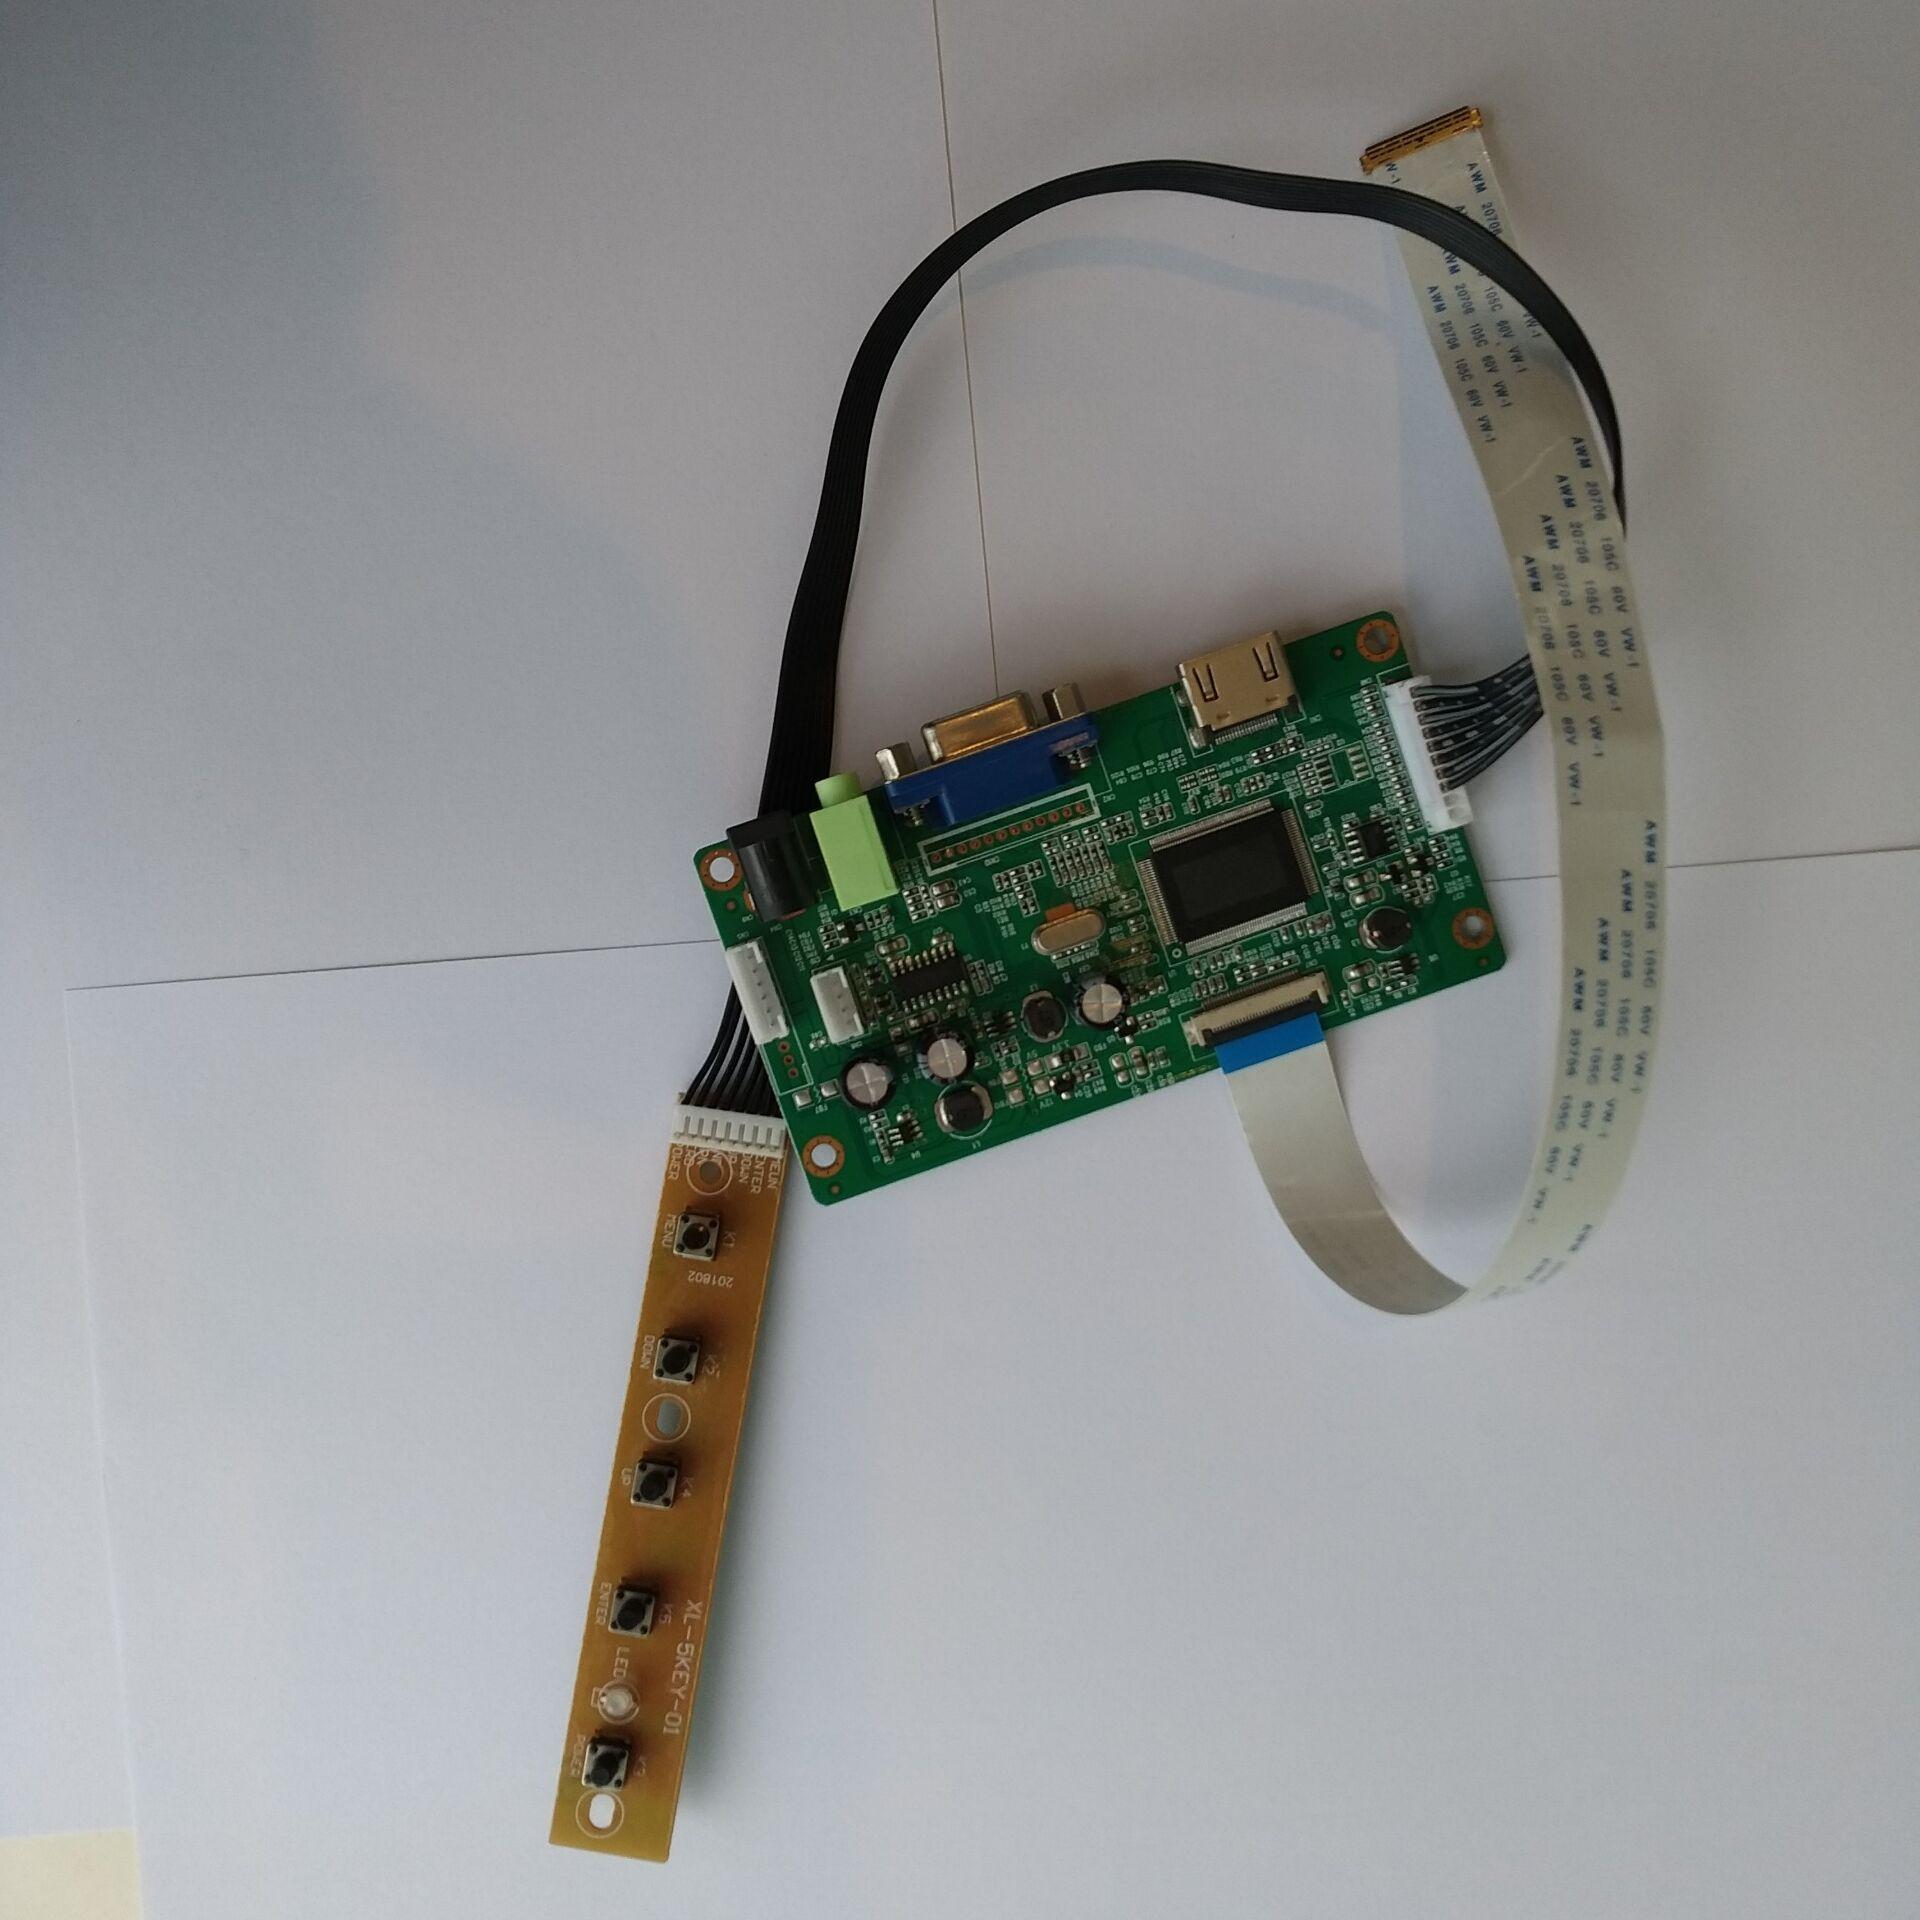 LED EDP HDMI-متوافق وحدة تحكم بشاشة إل سي دي لوحة المجلس شاشة عرض ل NV156FHM-A10/A11 15.6